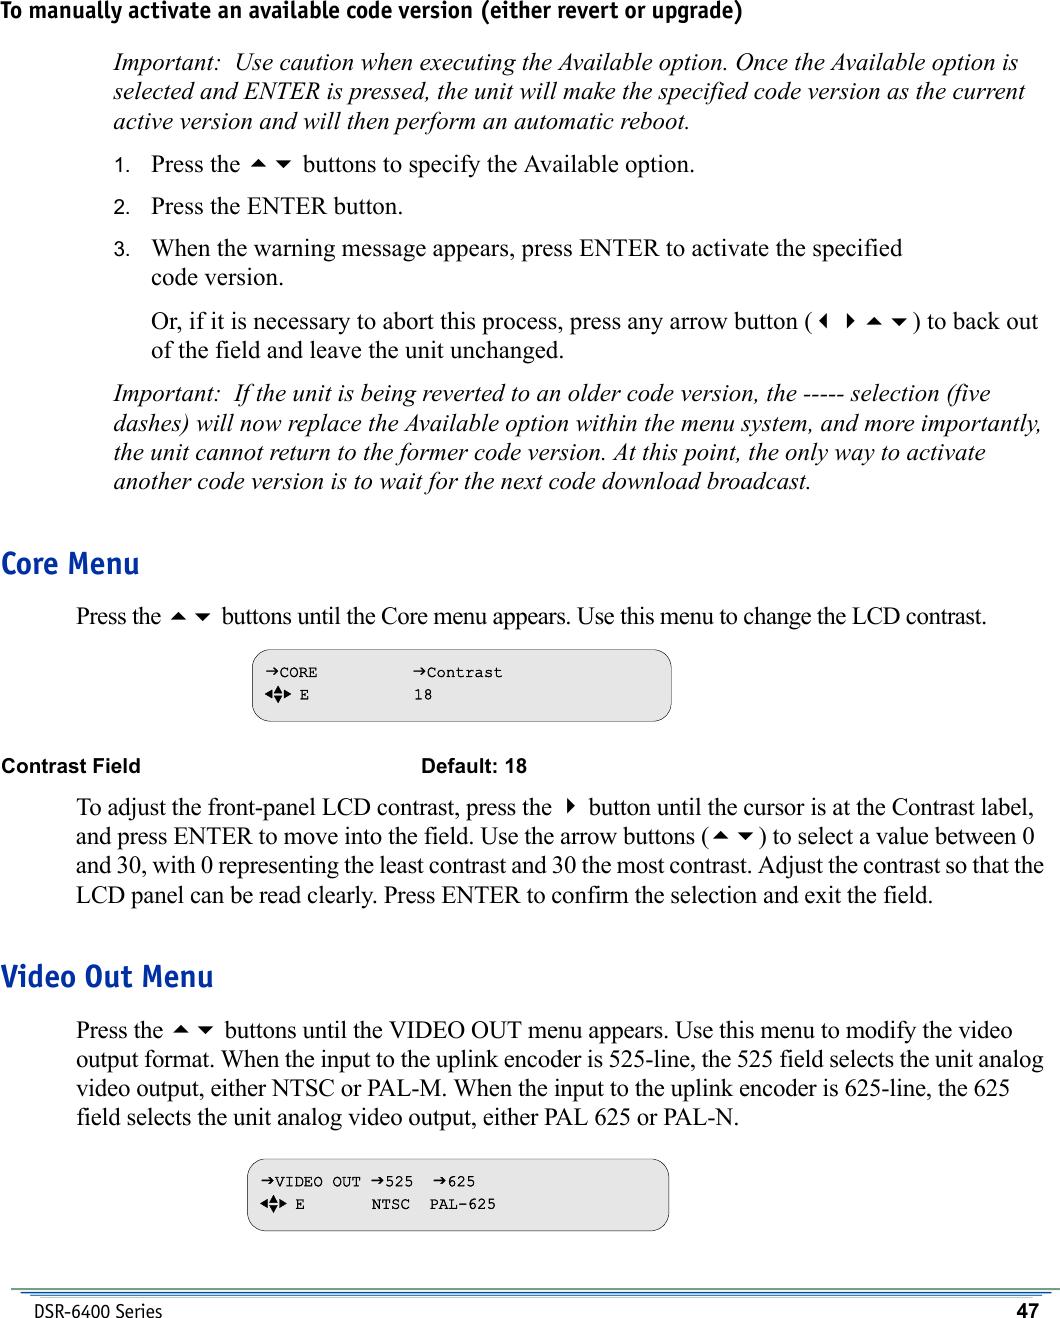 Motorola Car Satellite Radio System Dsr 6400 Users Manual